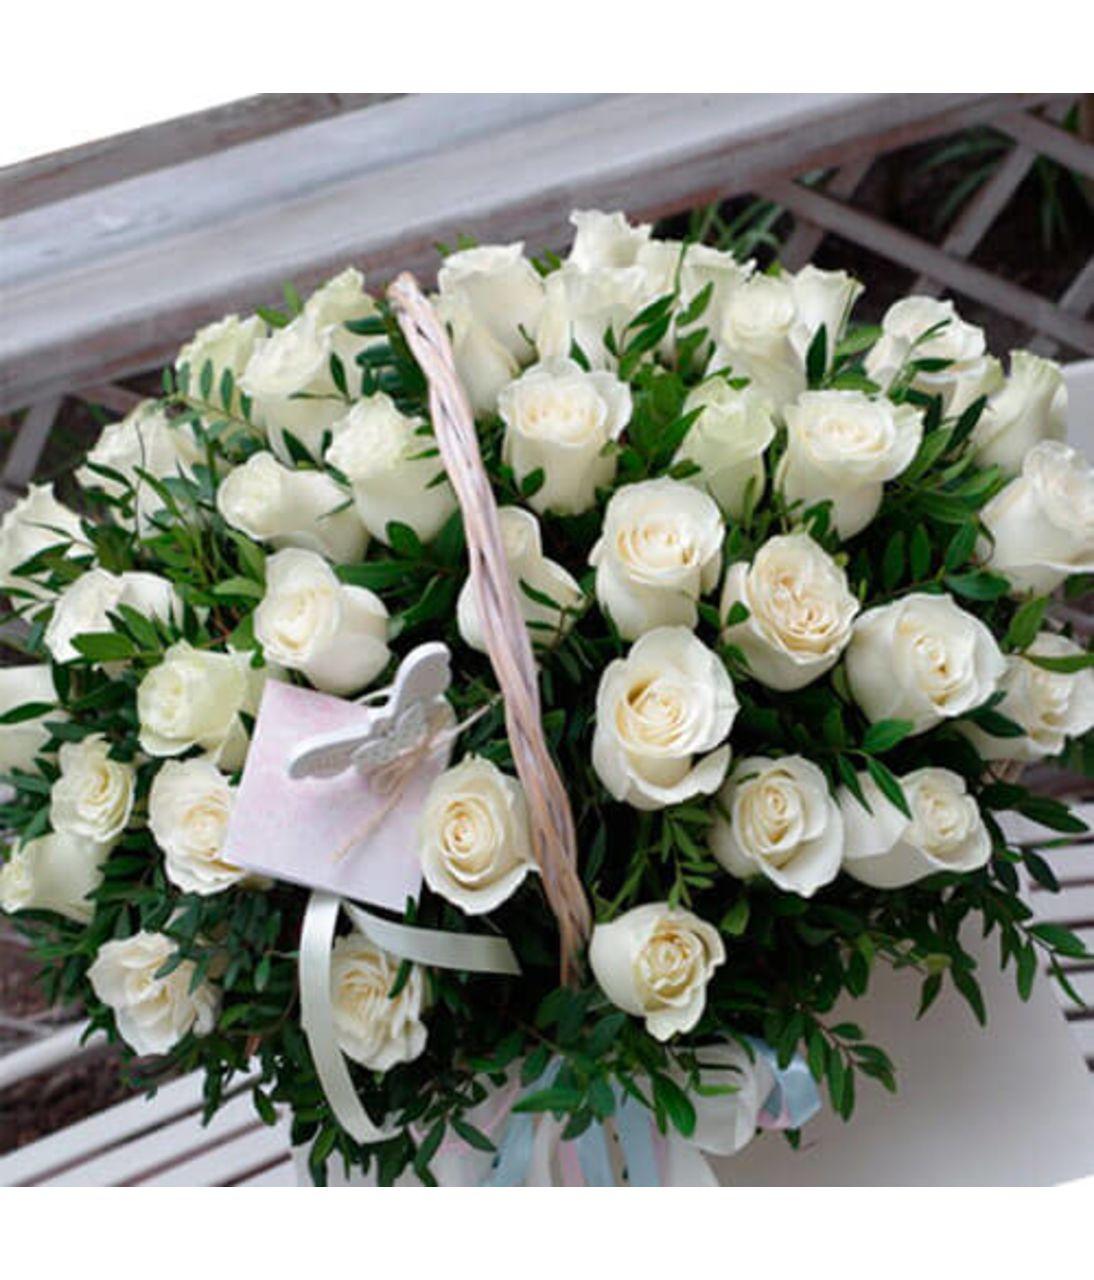 51 роза в корзине. Superflowers.com.ua